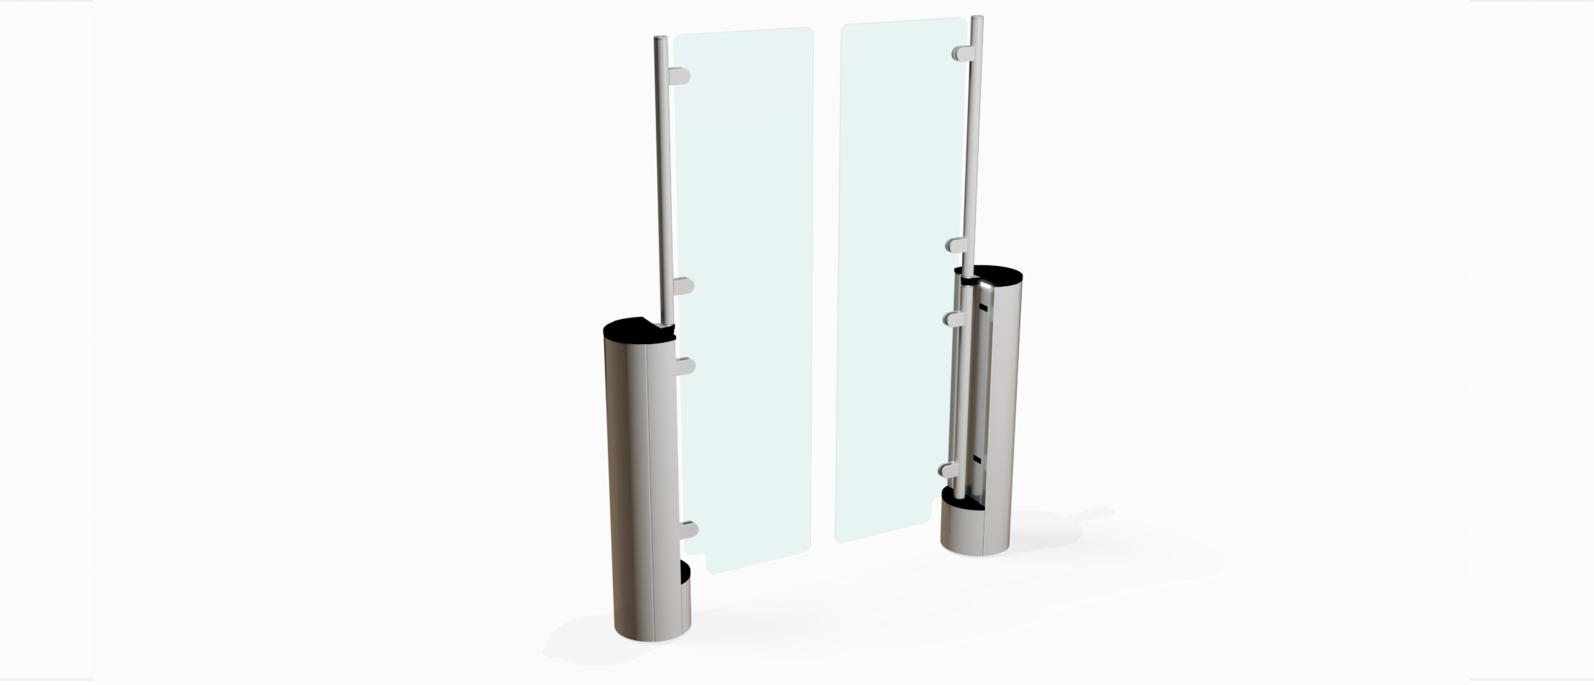 IG300 product image